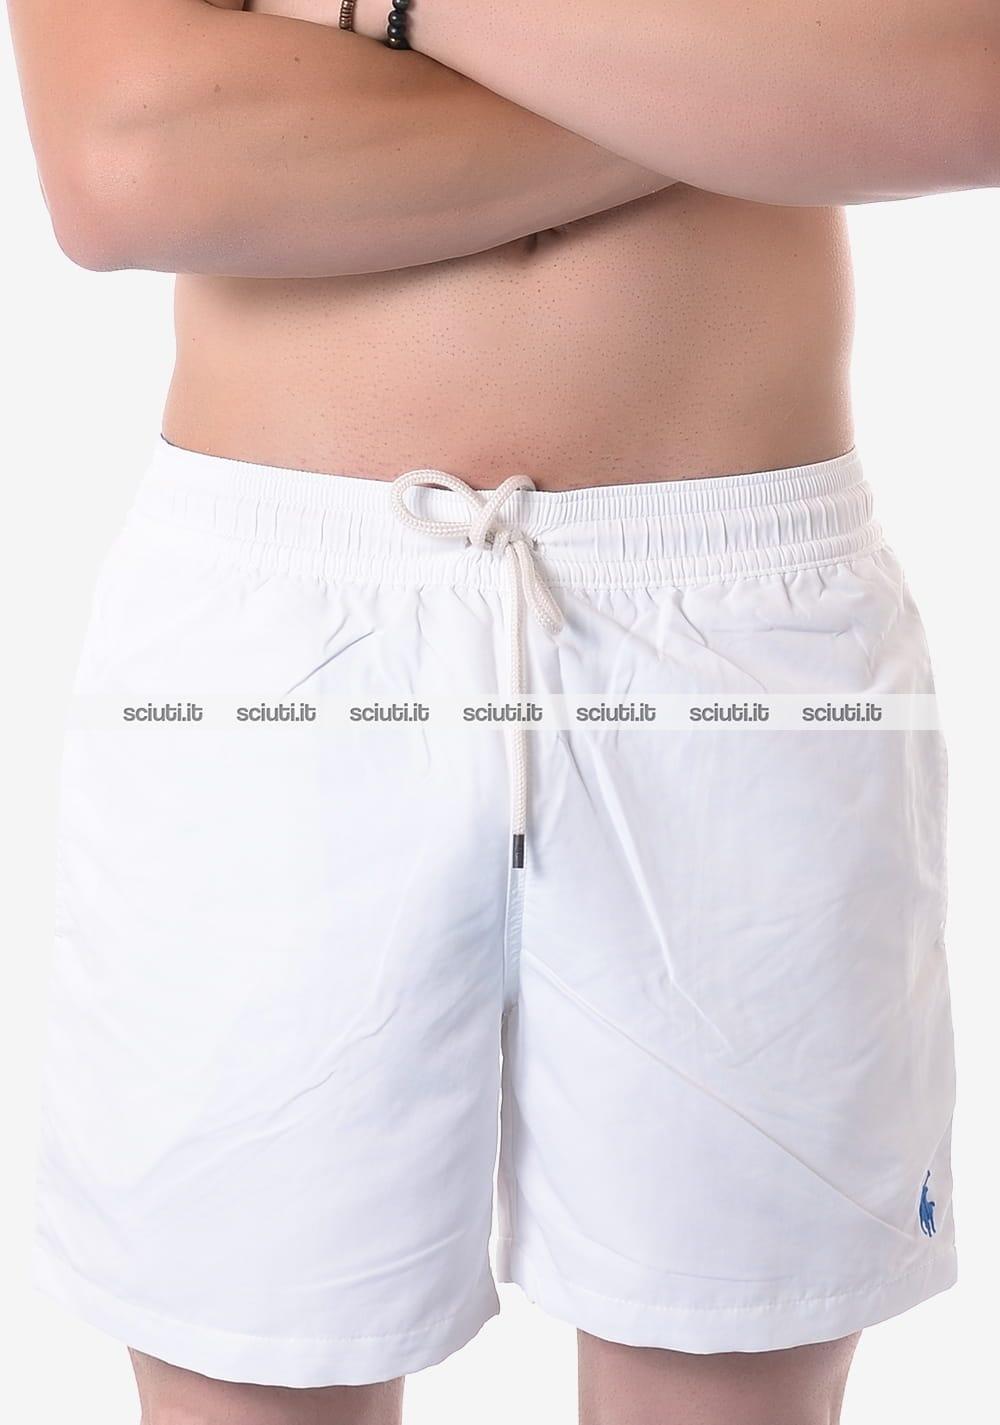 low priced c8f7b 5a41f Costume boxer Ralph Lauren uomo bianco